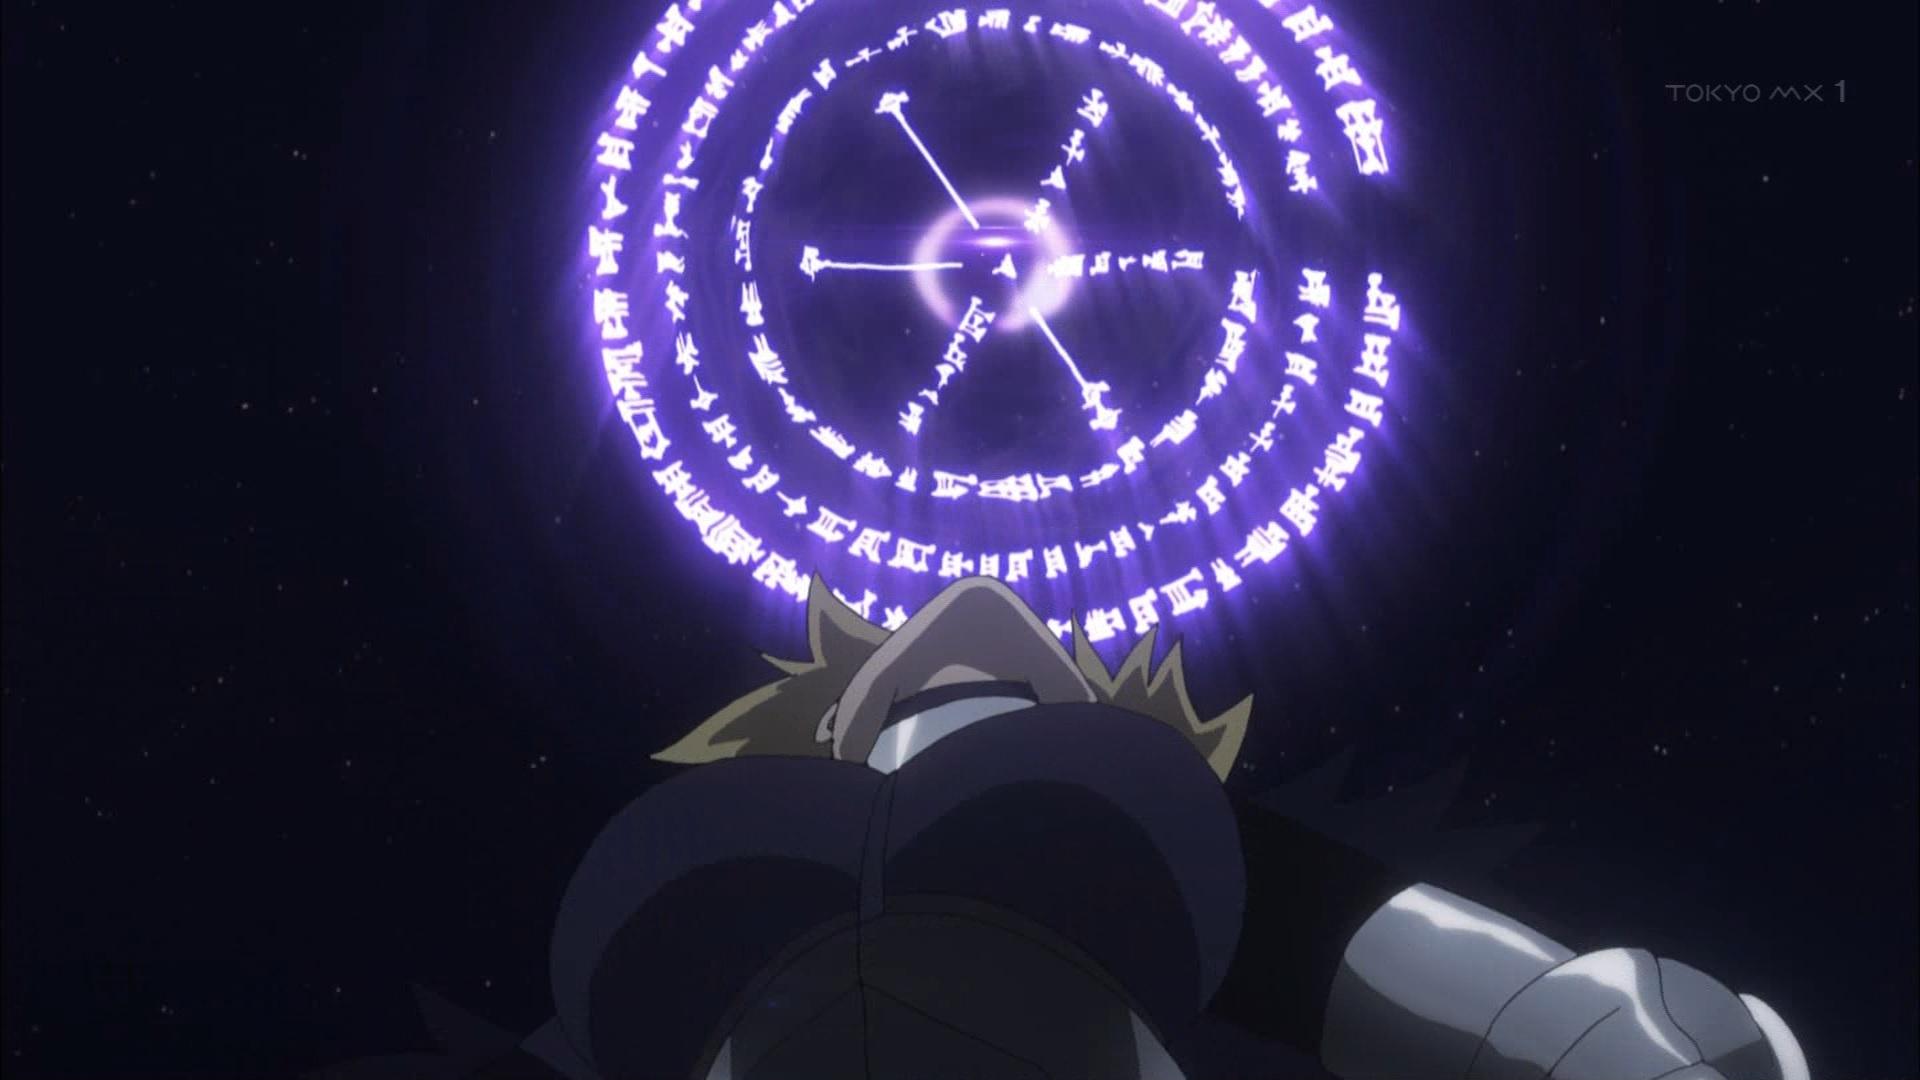 Fate Apocrypha 第話感想 シェイクスピアが最終決戦のカギ説 フェイトアポクリファ